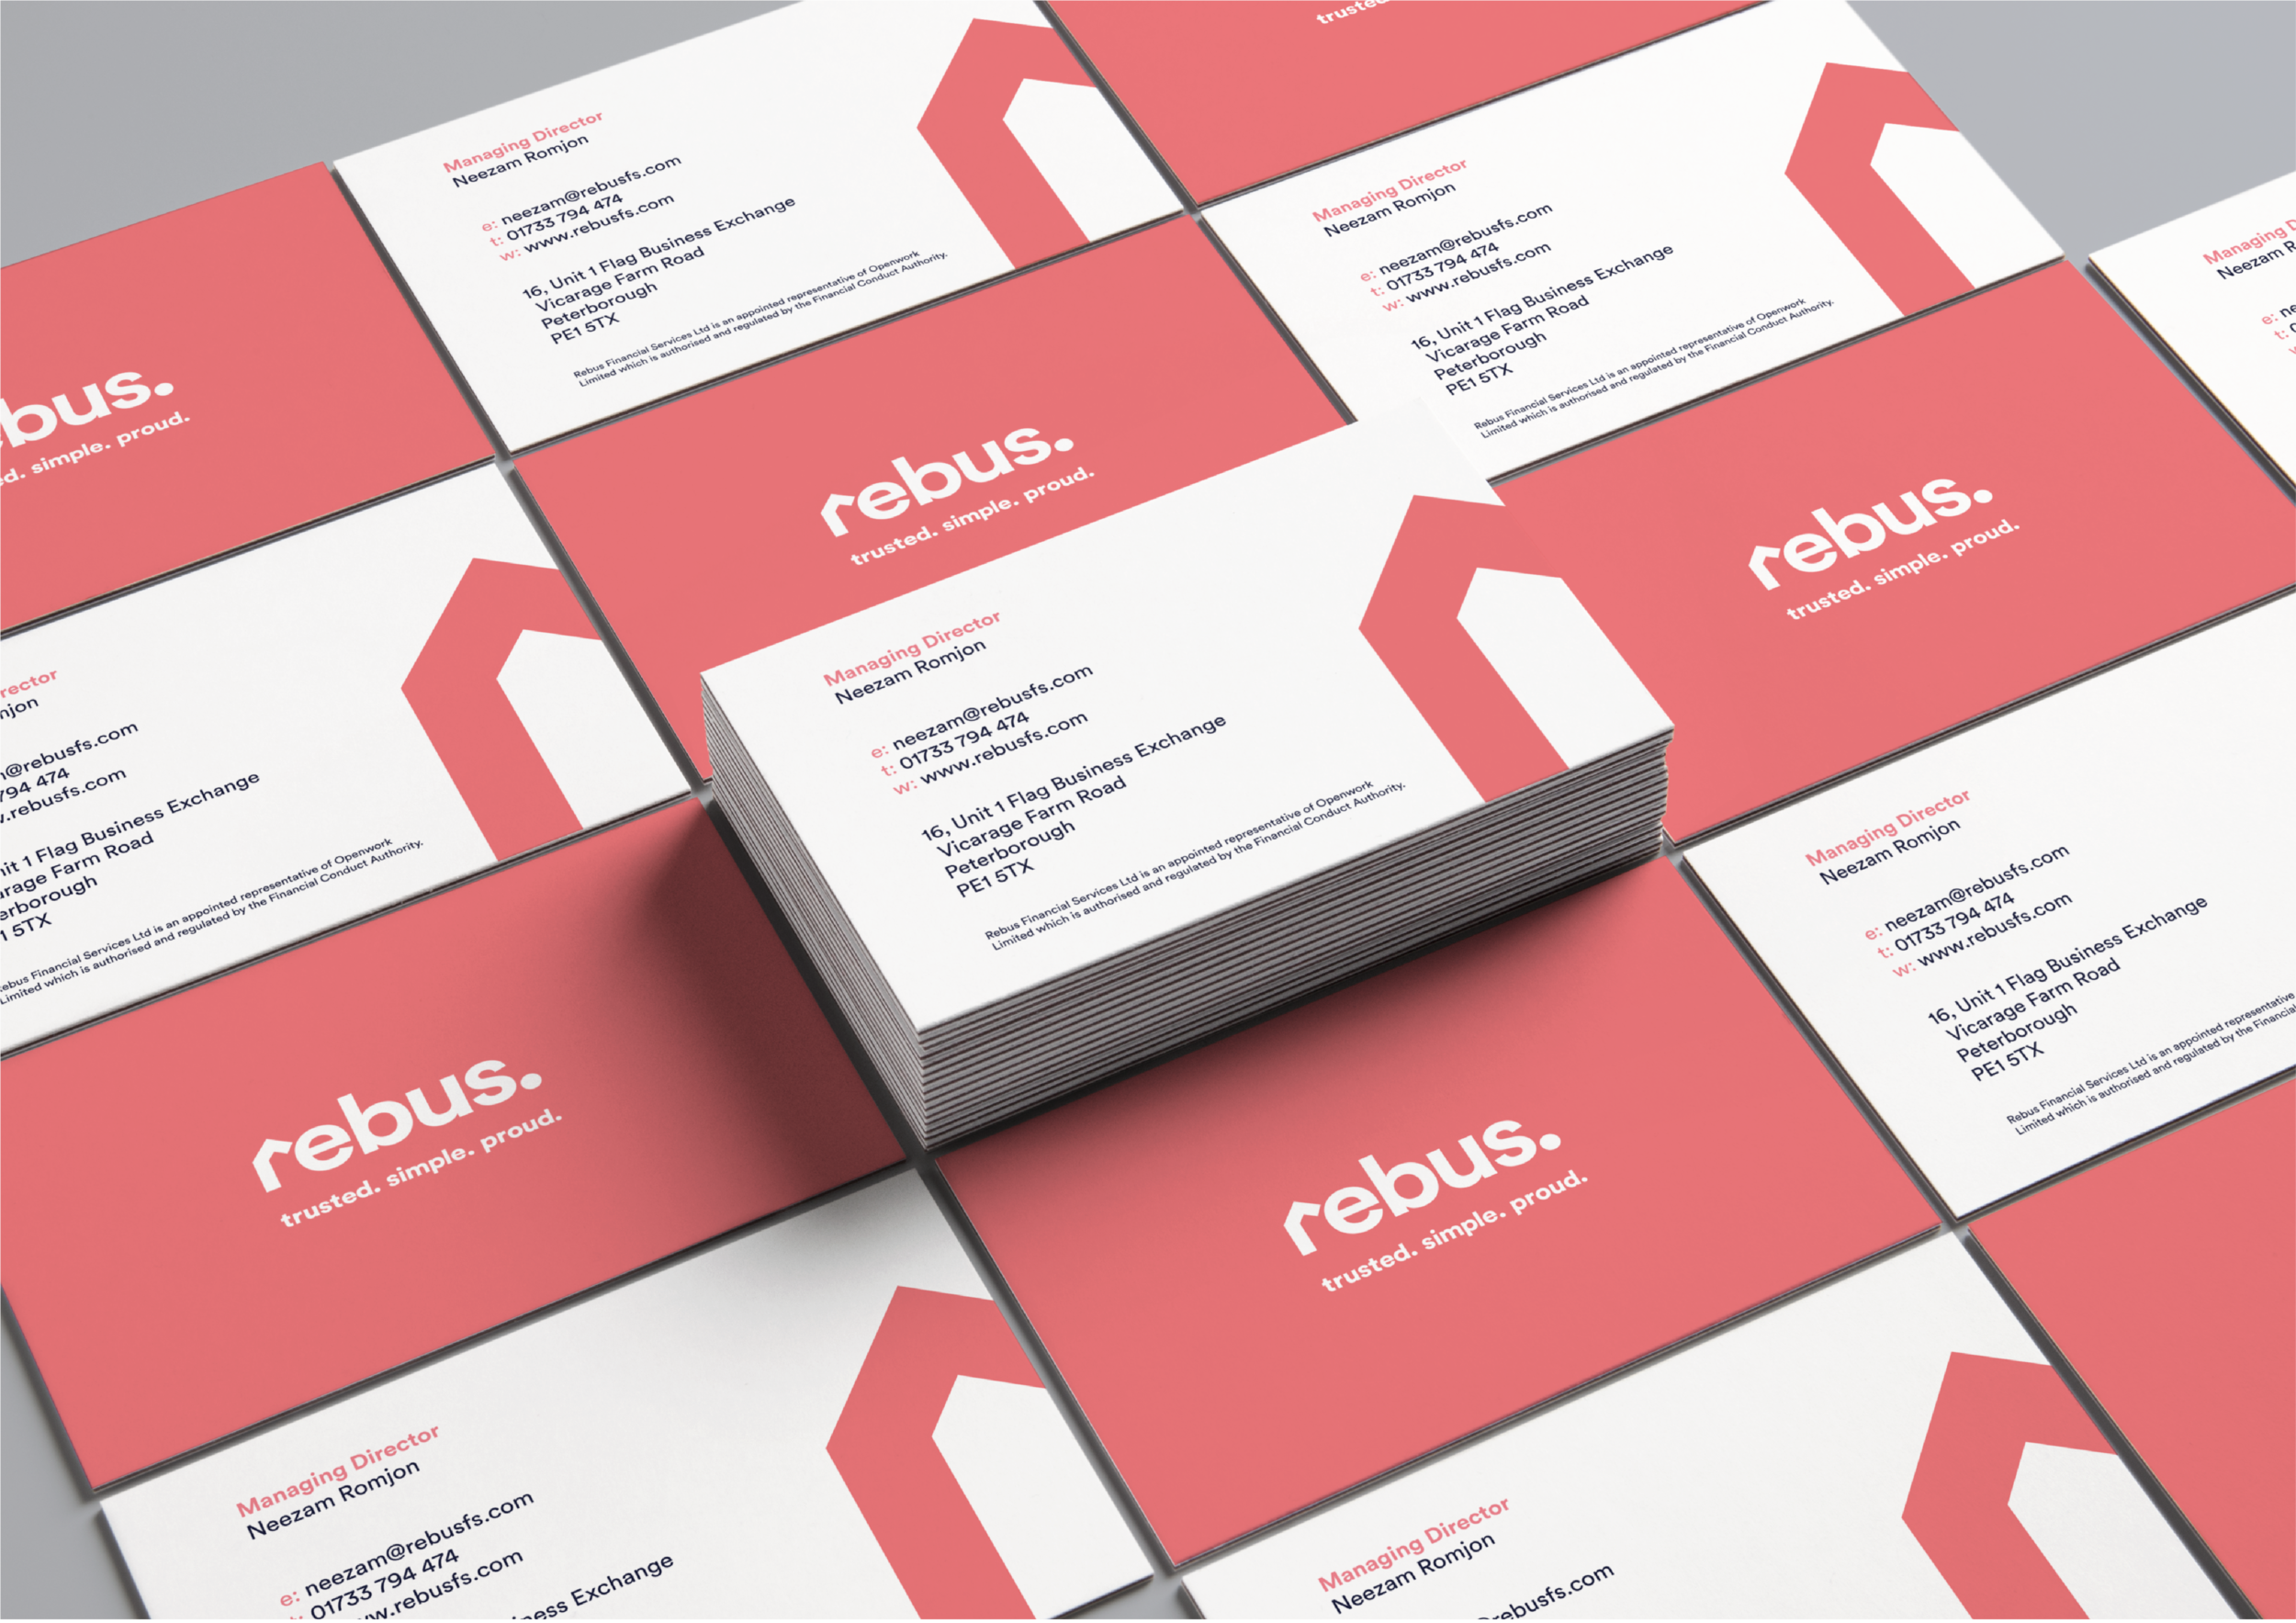 Rebus branding-03.png